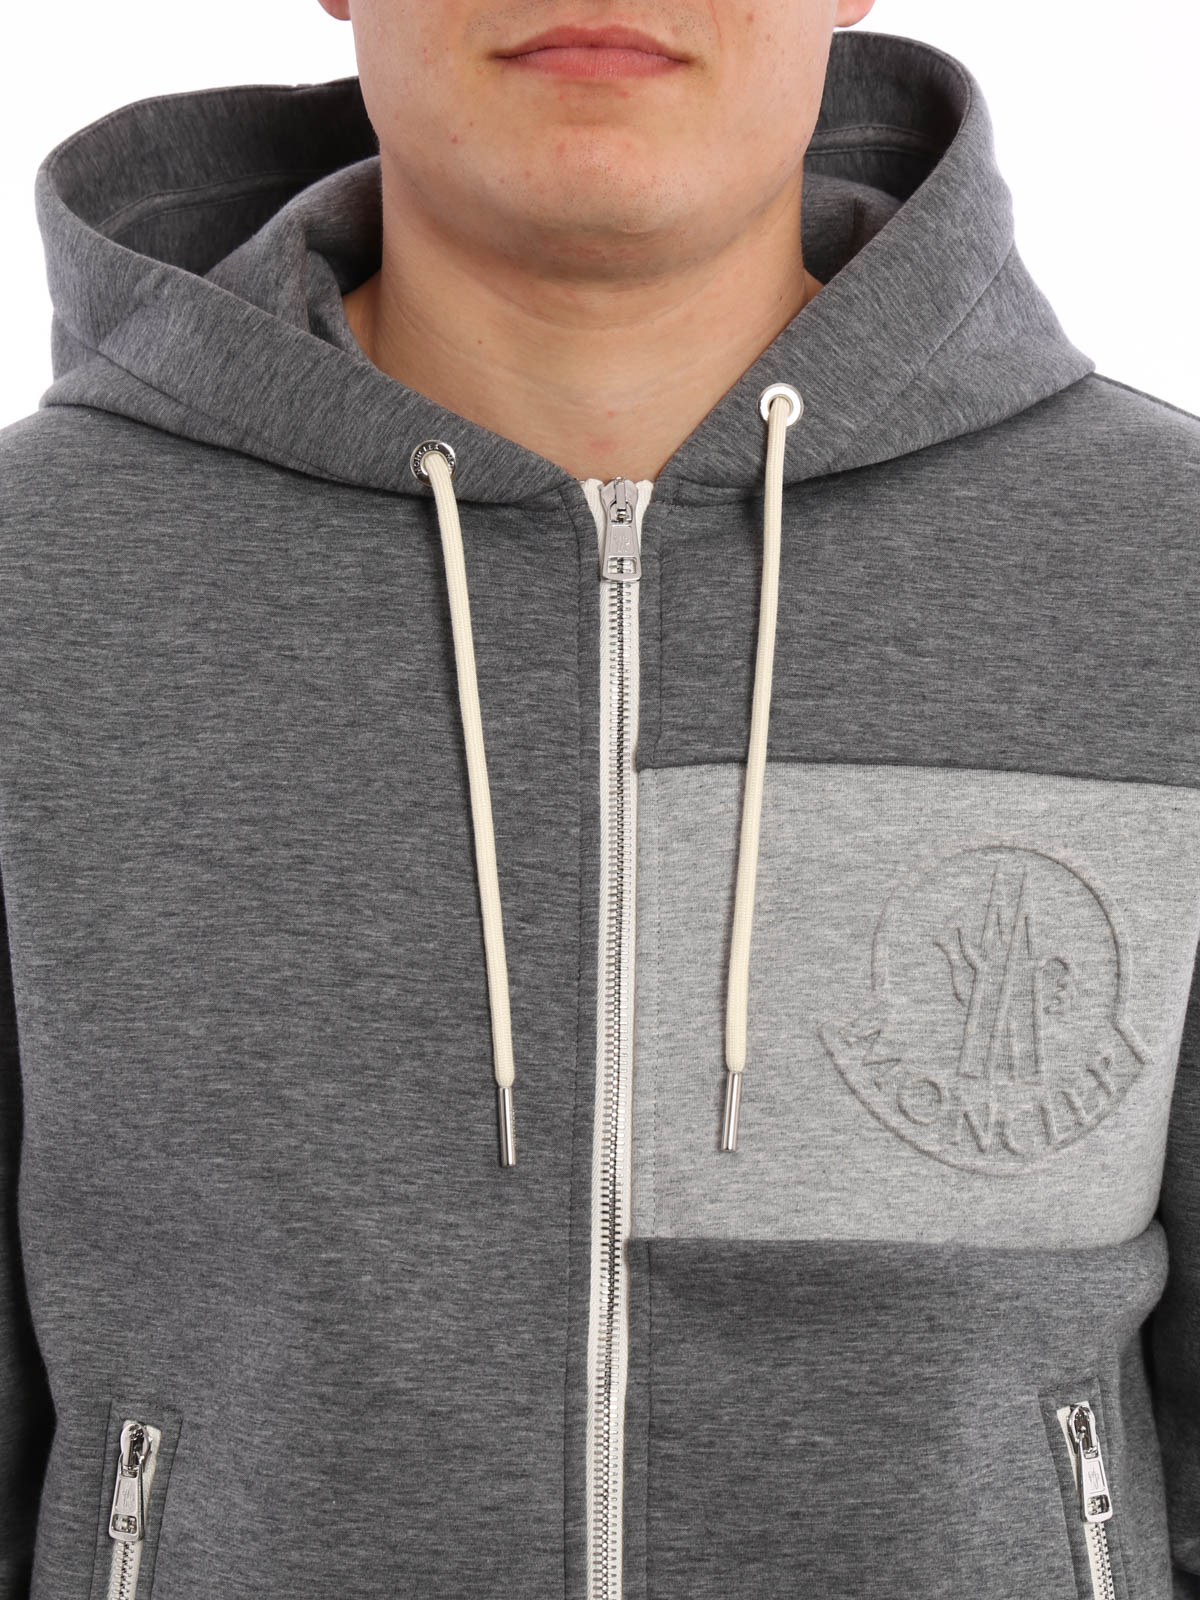 moncler sweatshirt grau